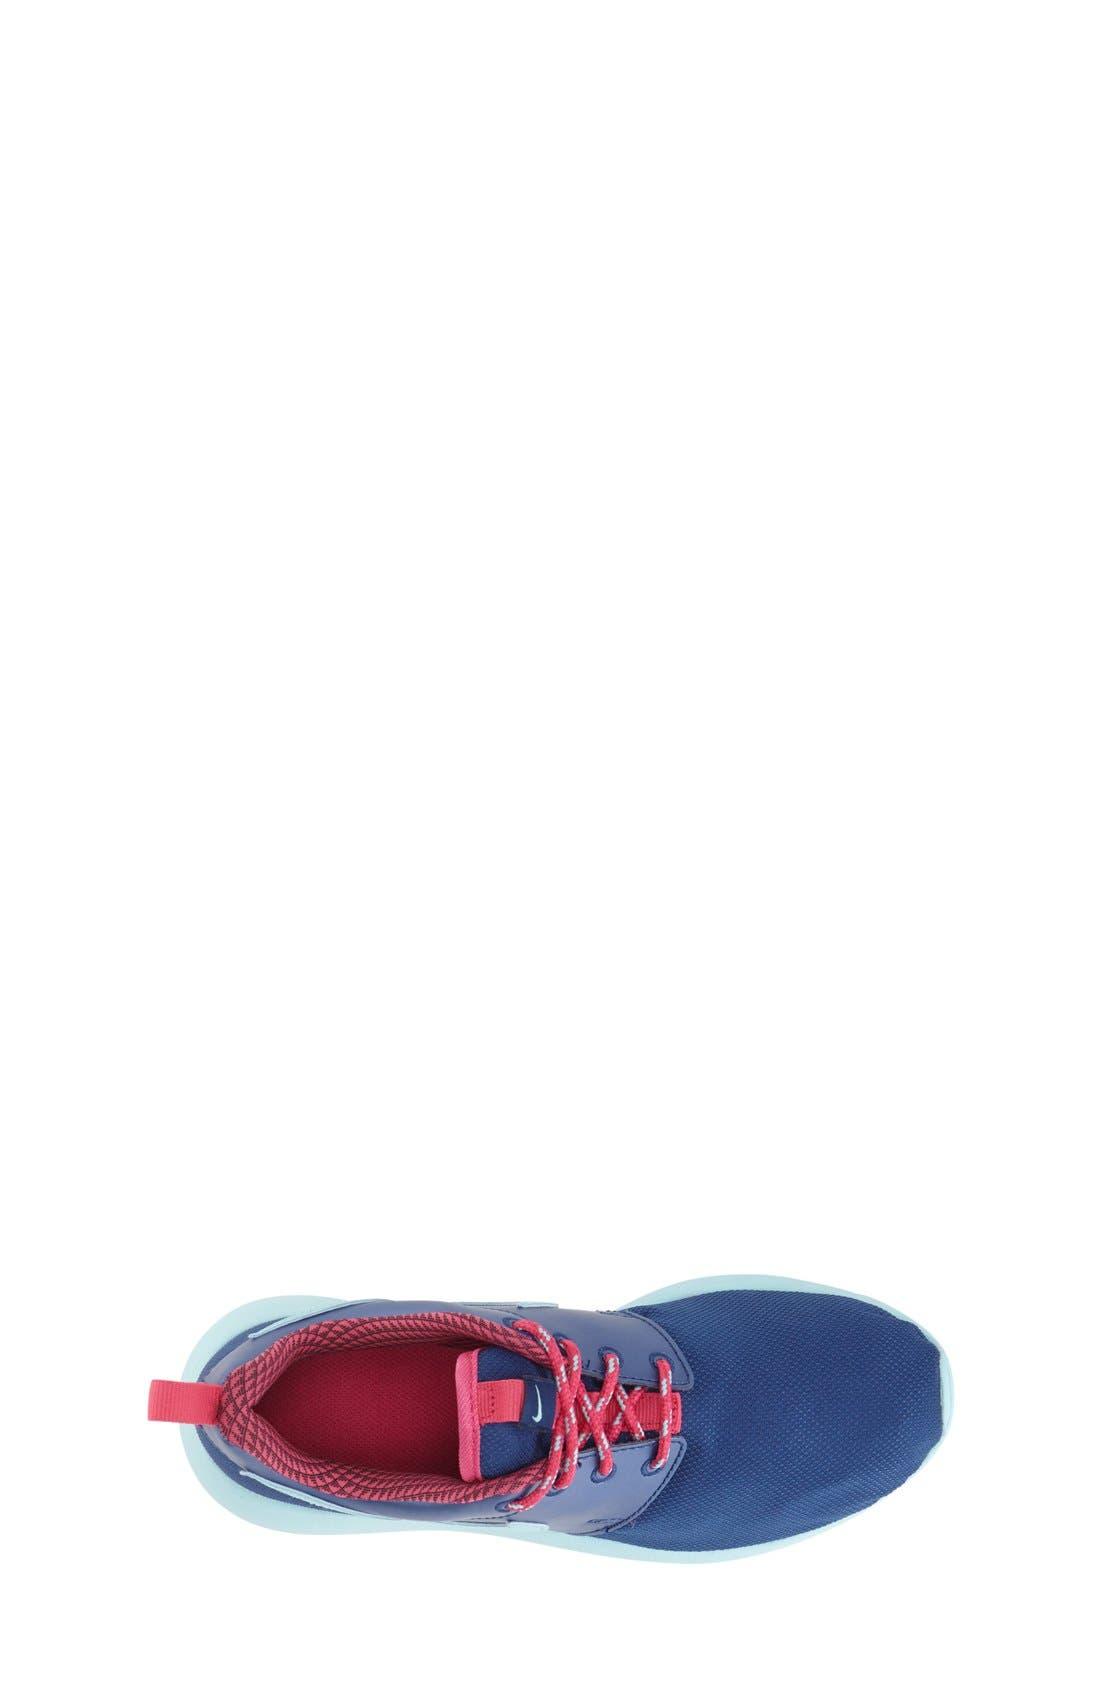 'Roshe Run' Athletic Shoe,                             Alternate thumbnail 132, color,